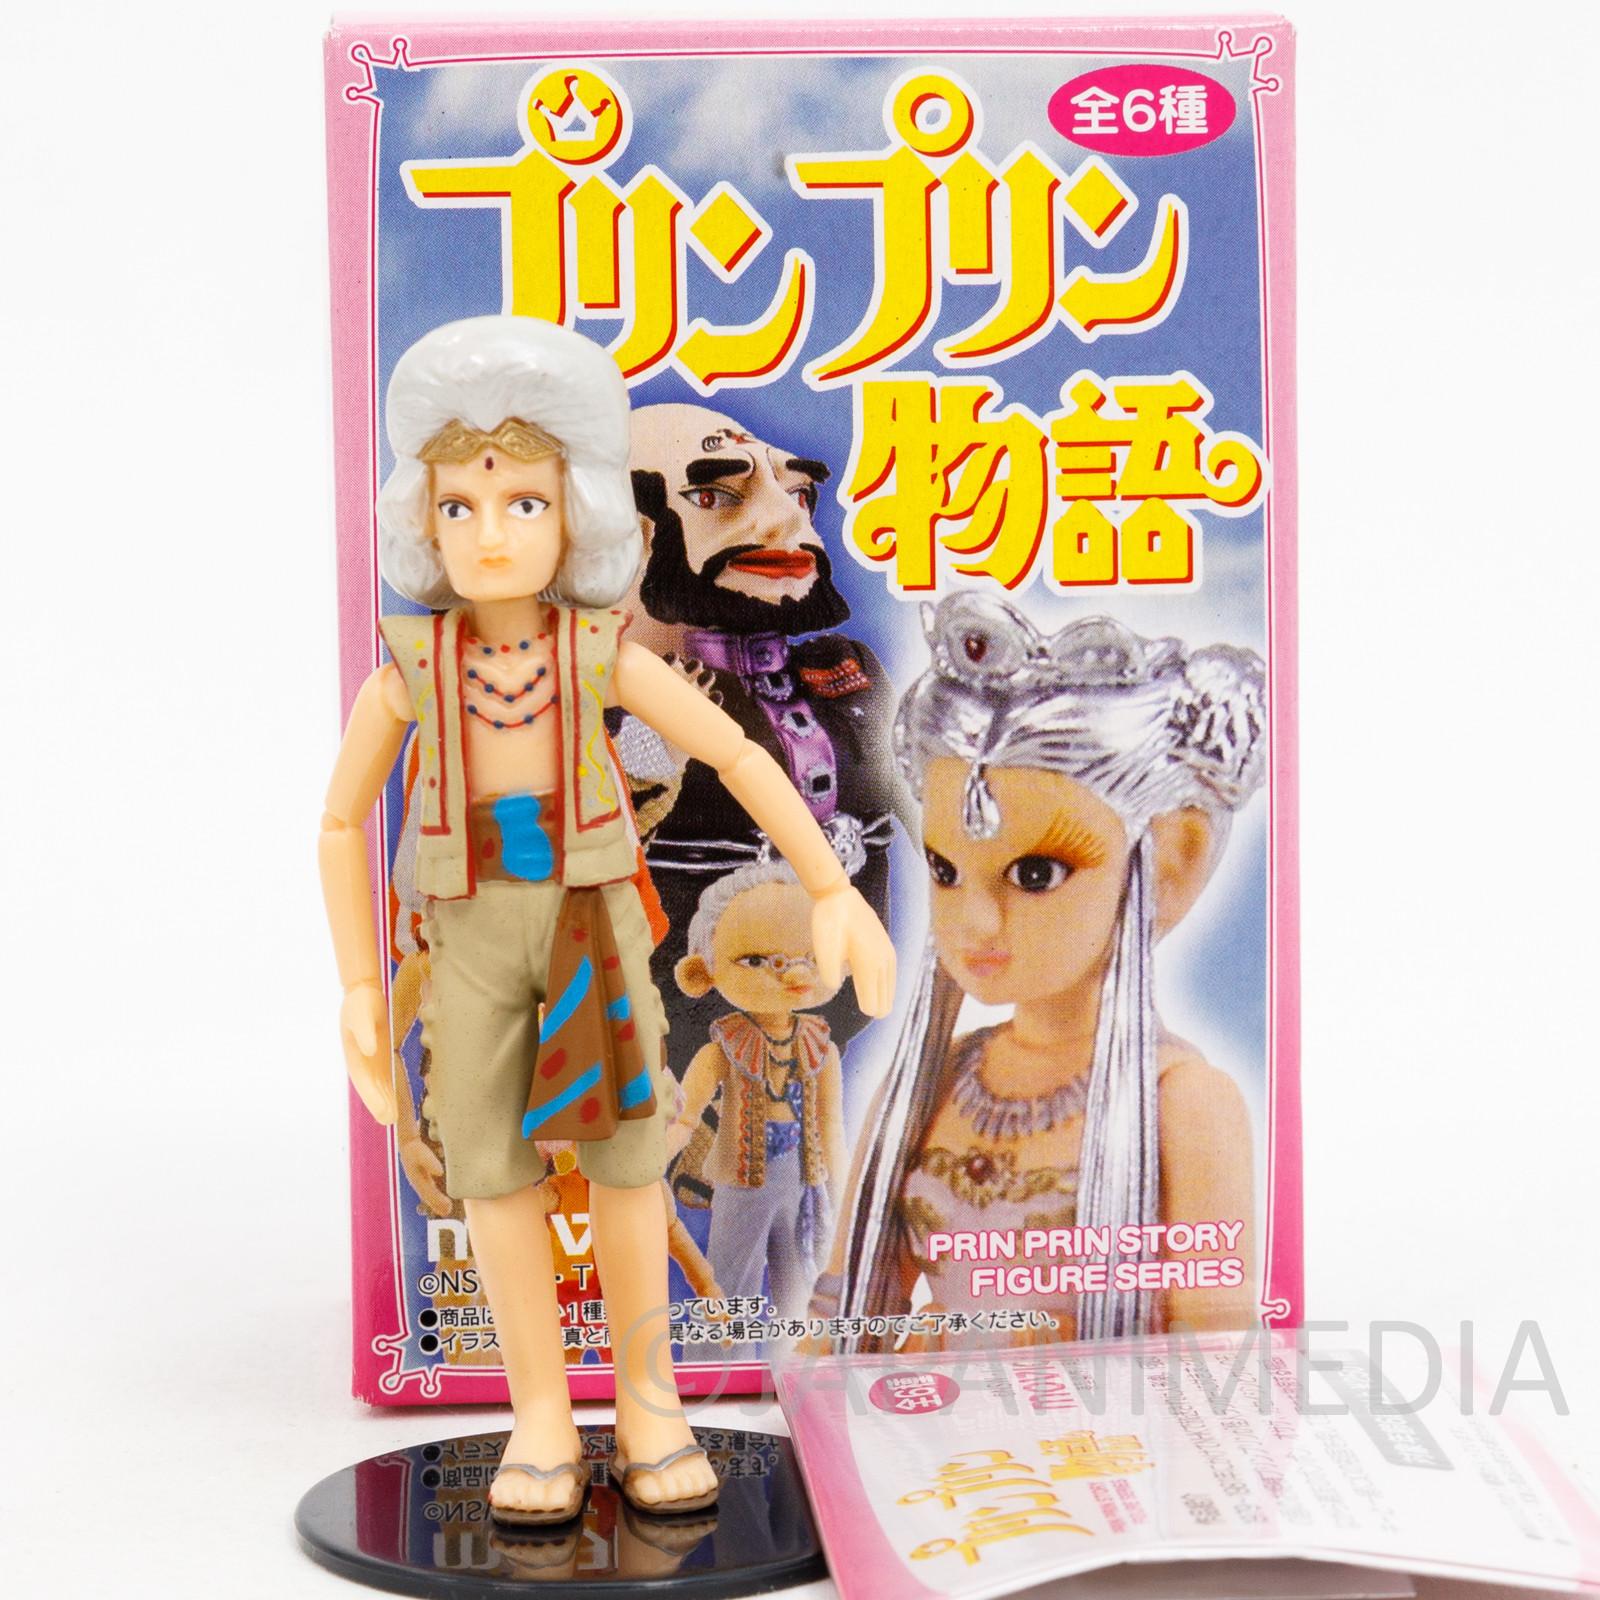 Purin Purin Monogatari BonBon Figure Puppet Show NHK TV JAPAN ANIME